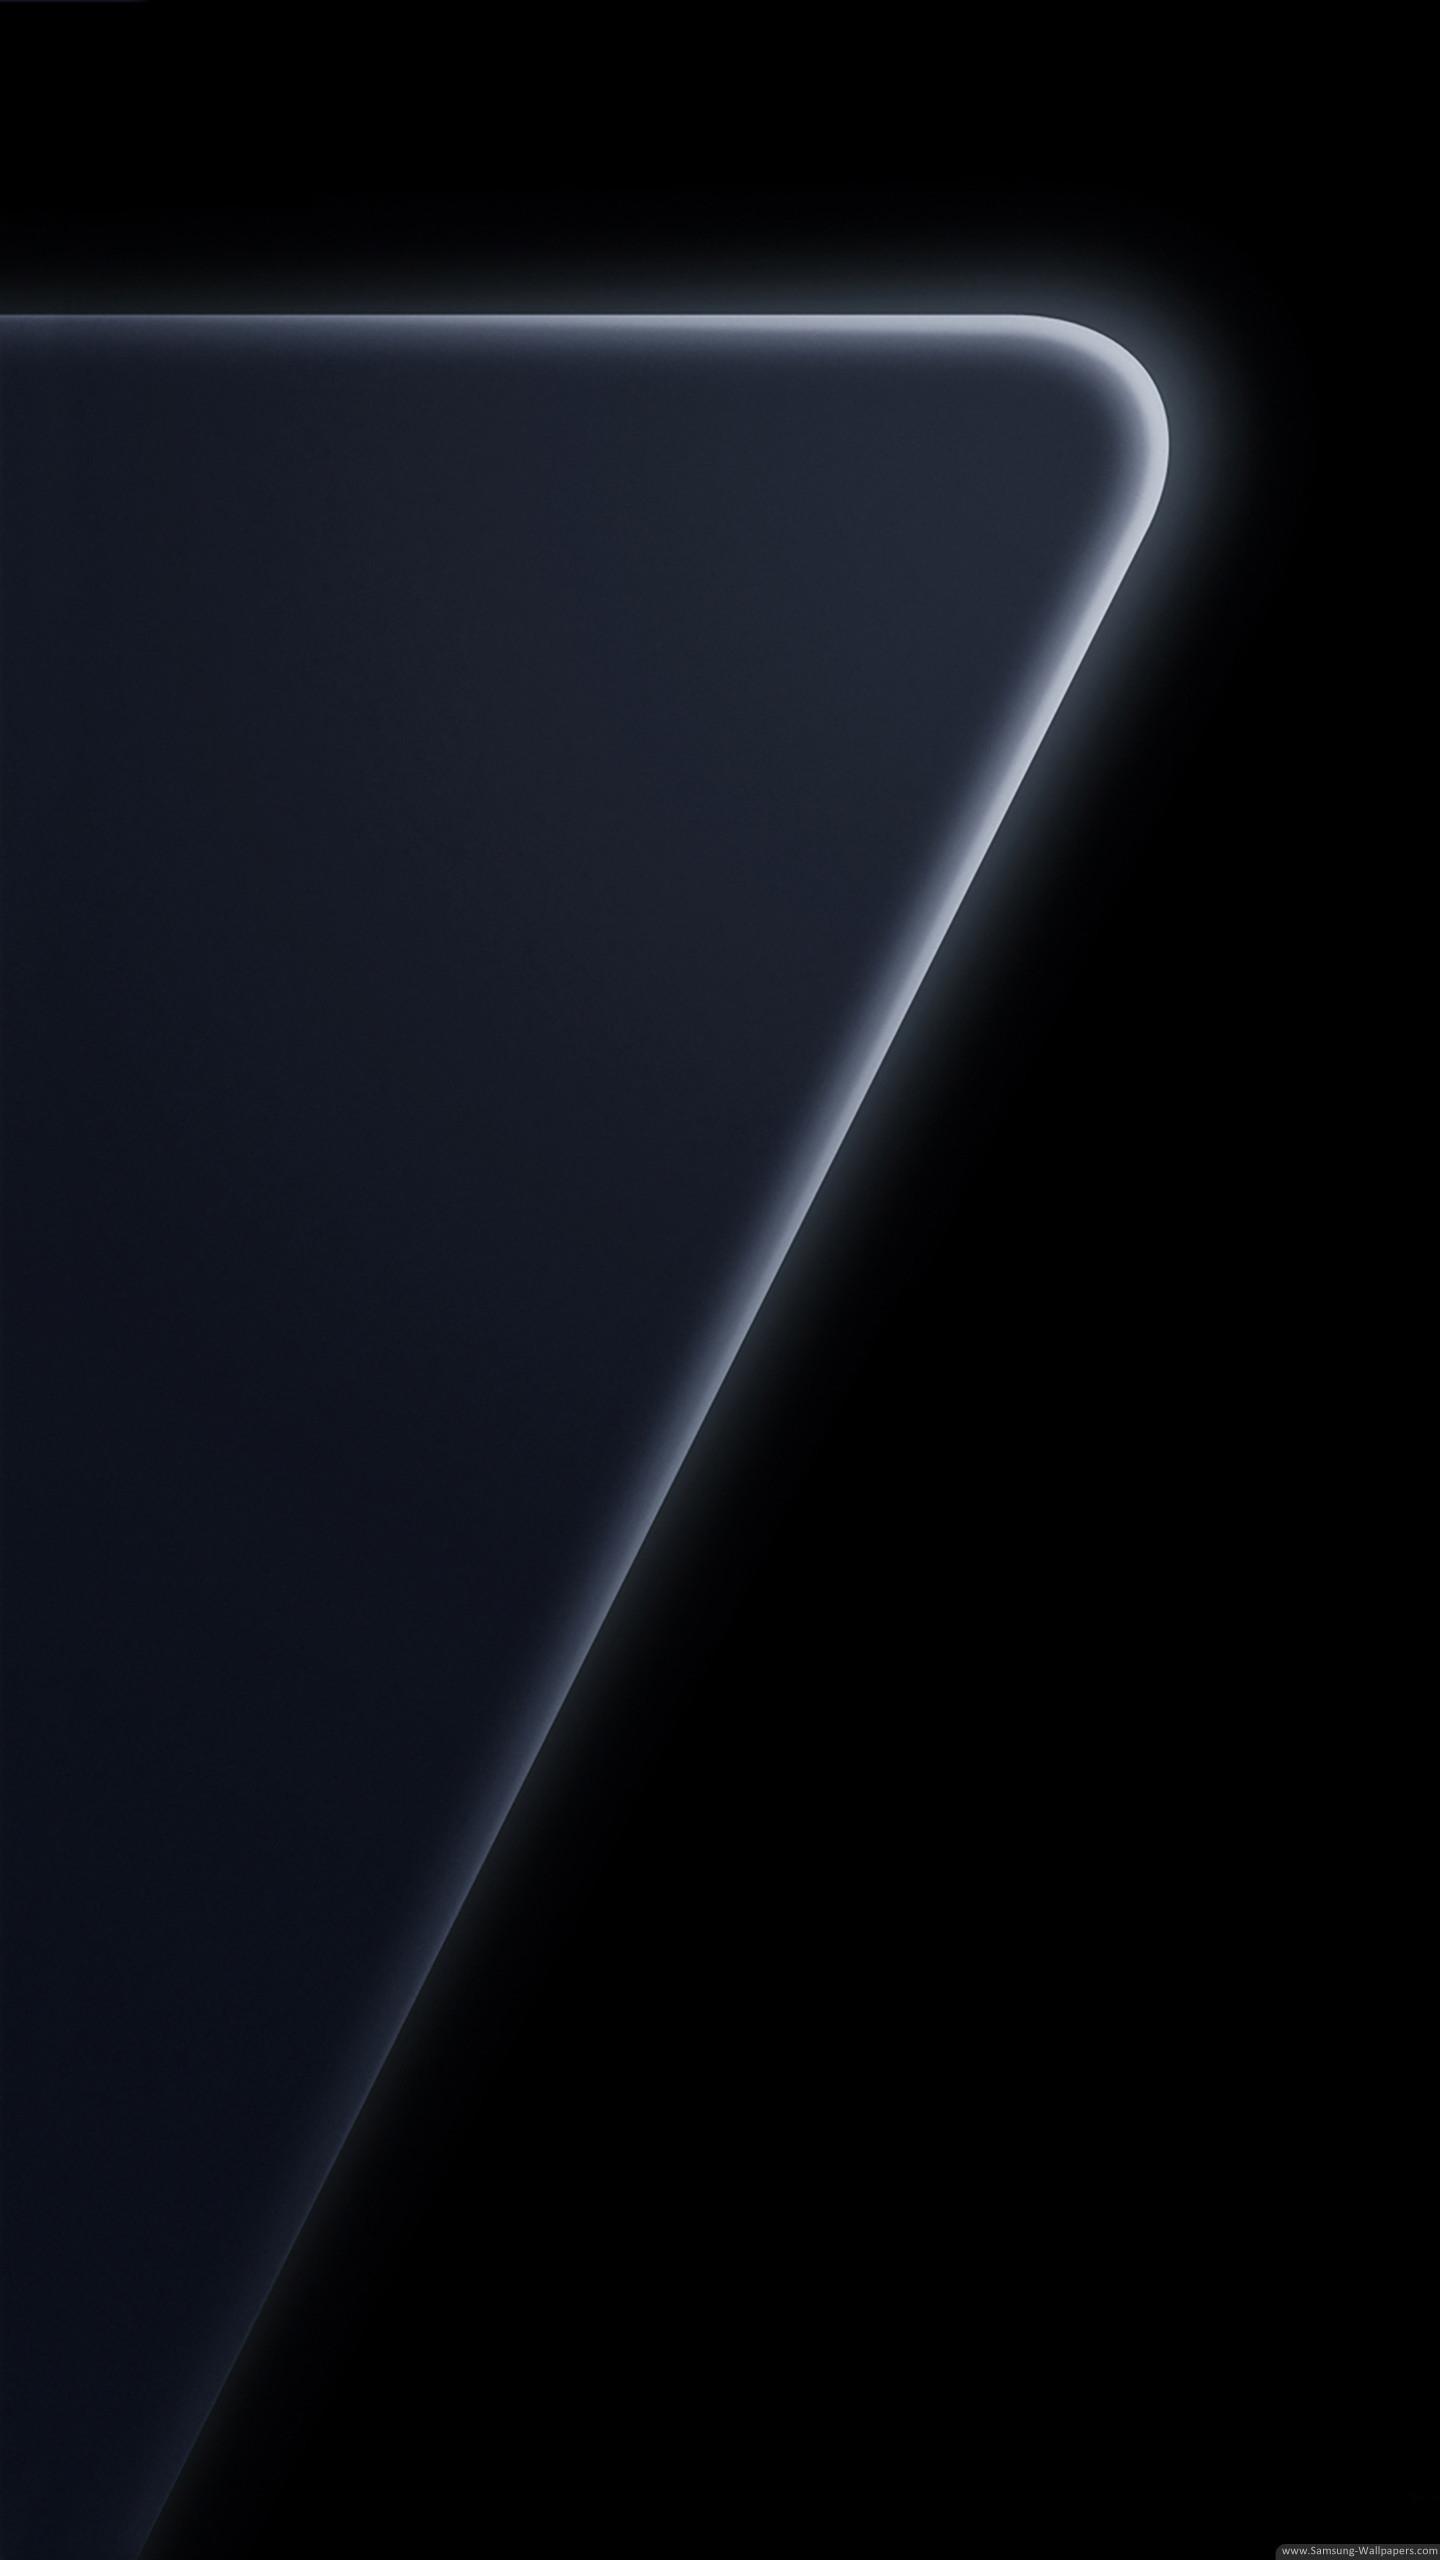 1440x2560 Samsung Galaxy S7 Edge Official Black Stock Wallpaper HD Download